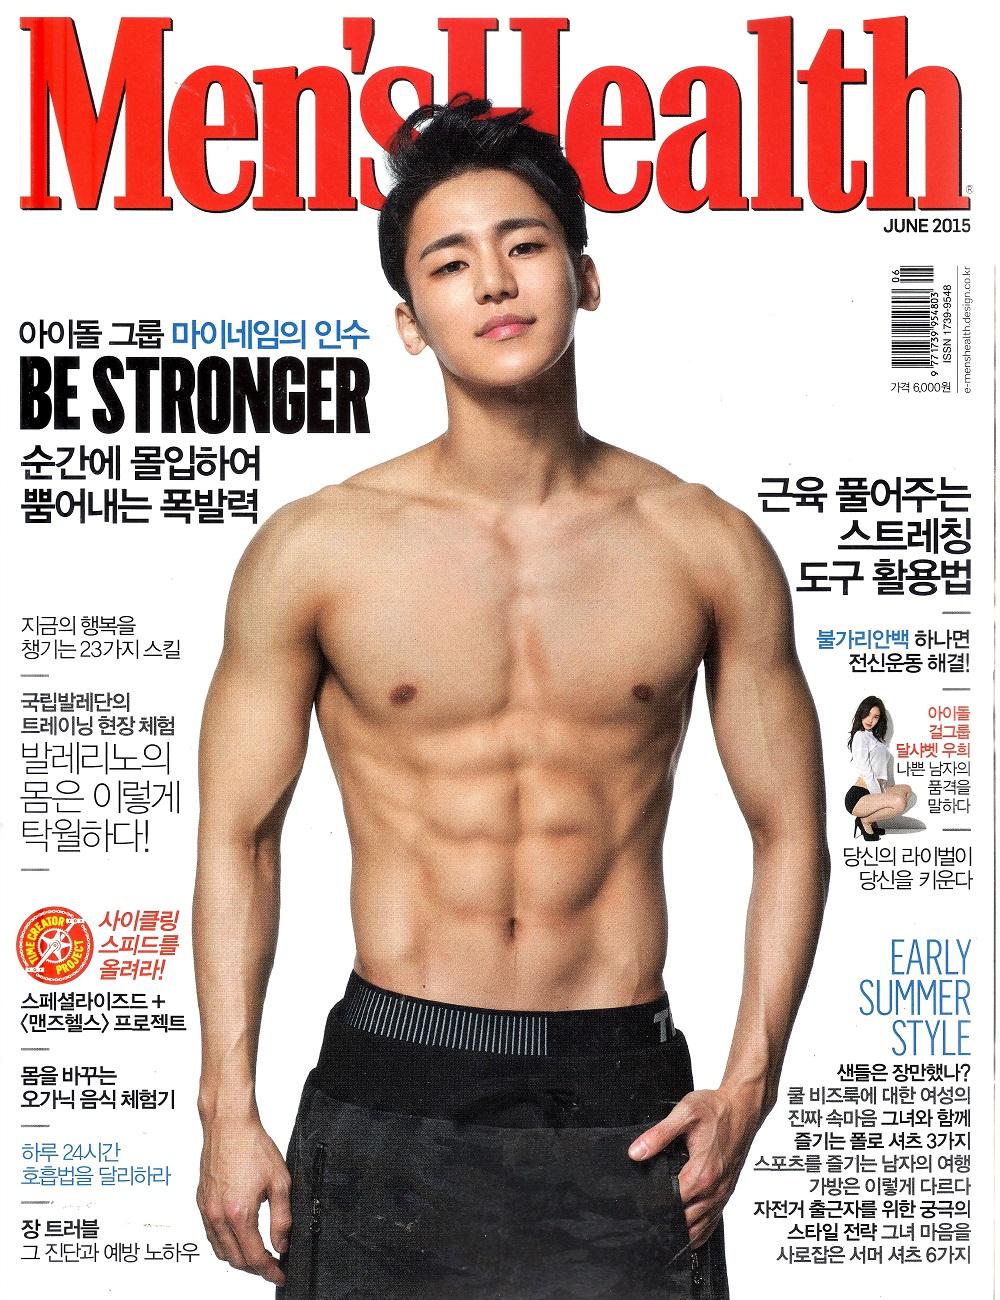 Men's Health Jun 15